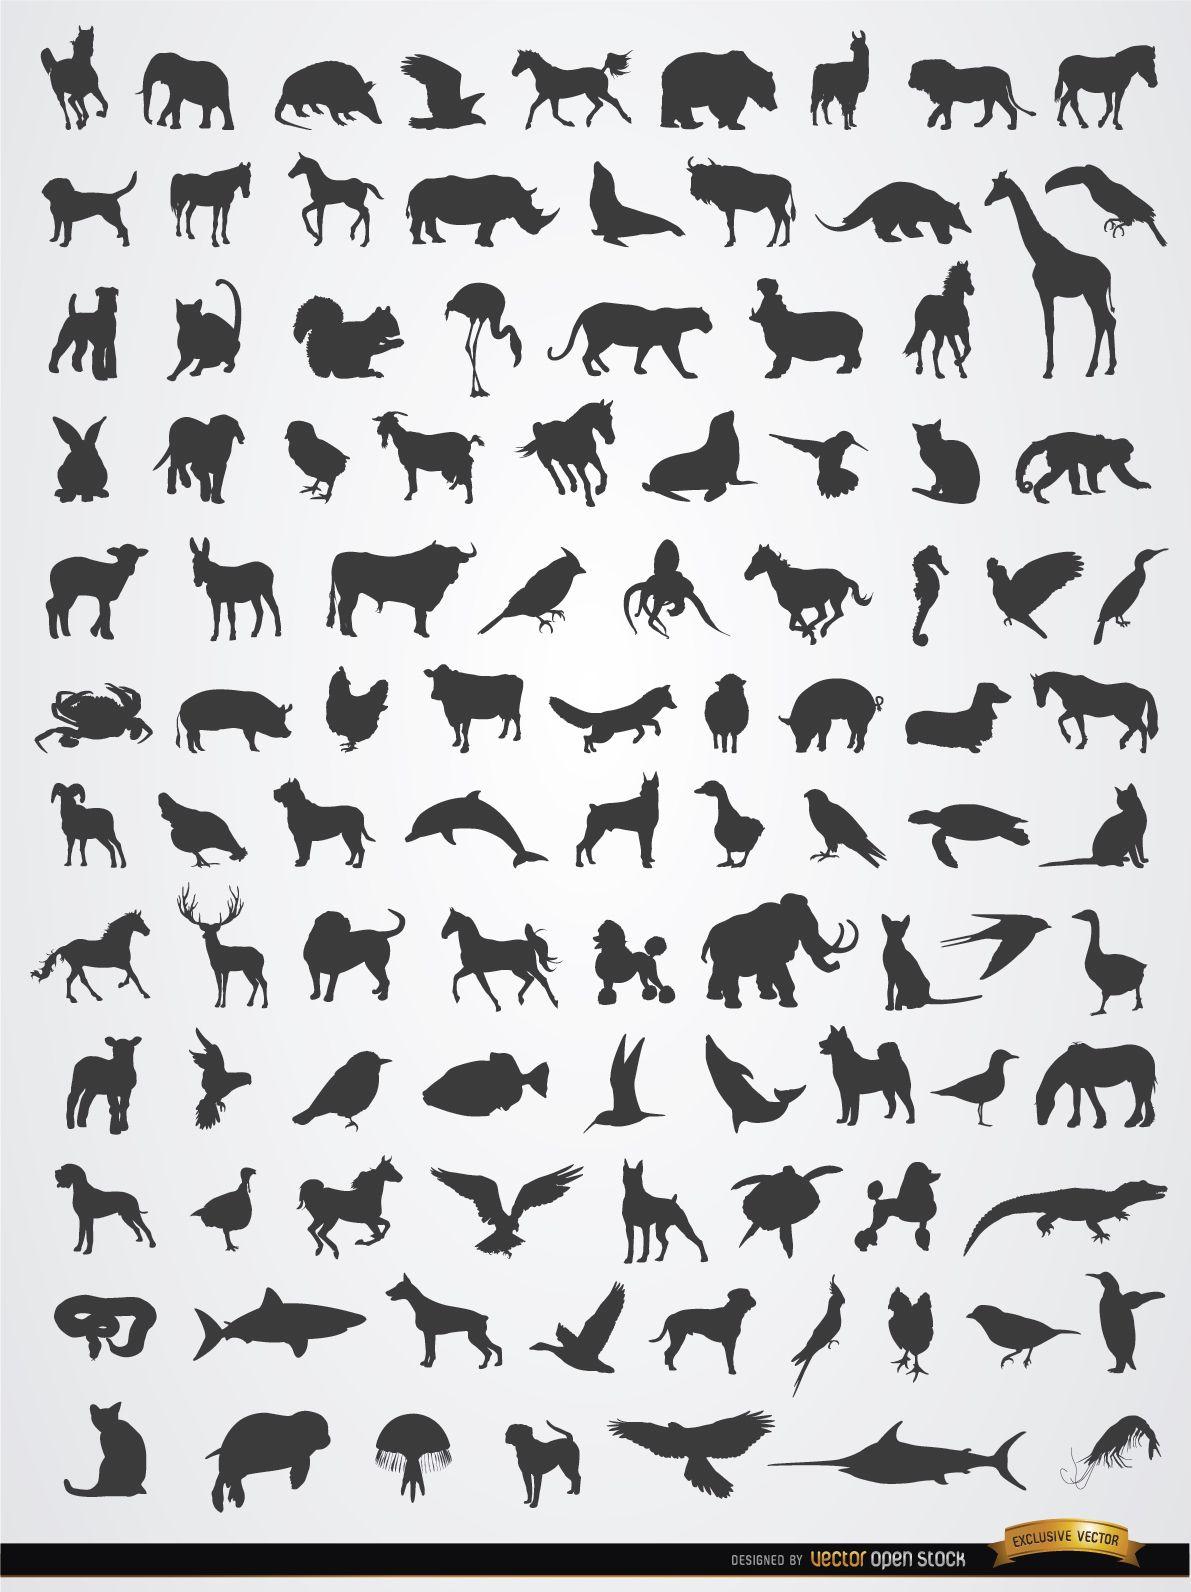 Terrestrial aerial and aquatic animal silhouettes